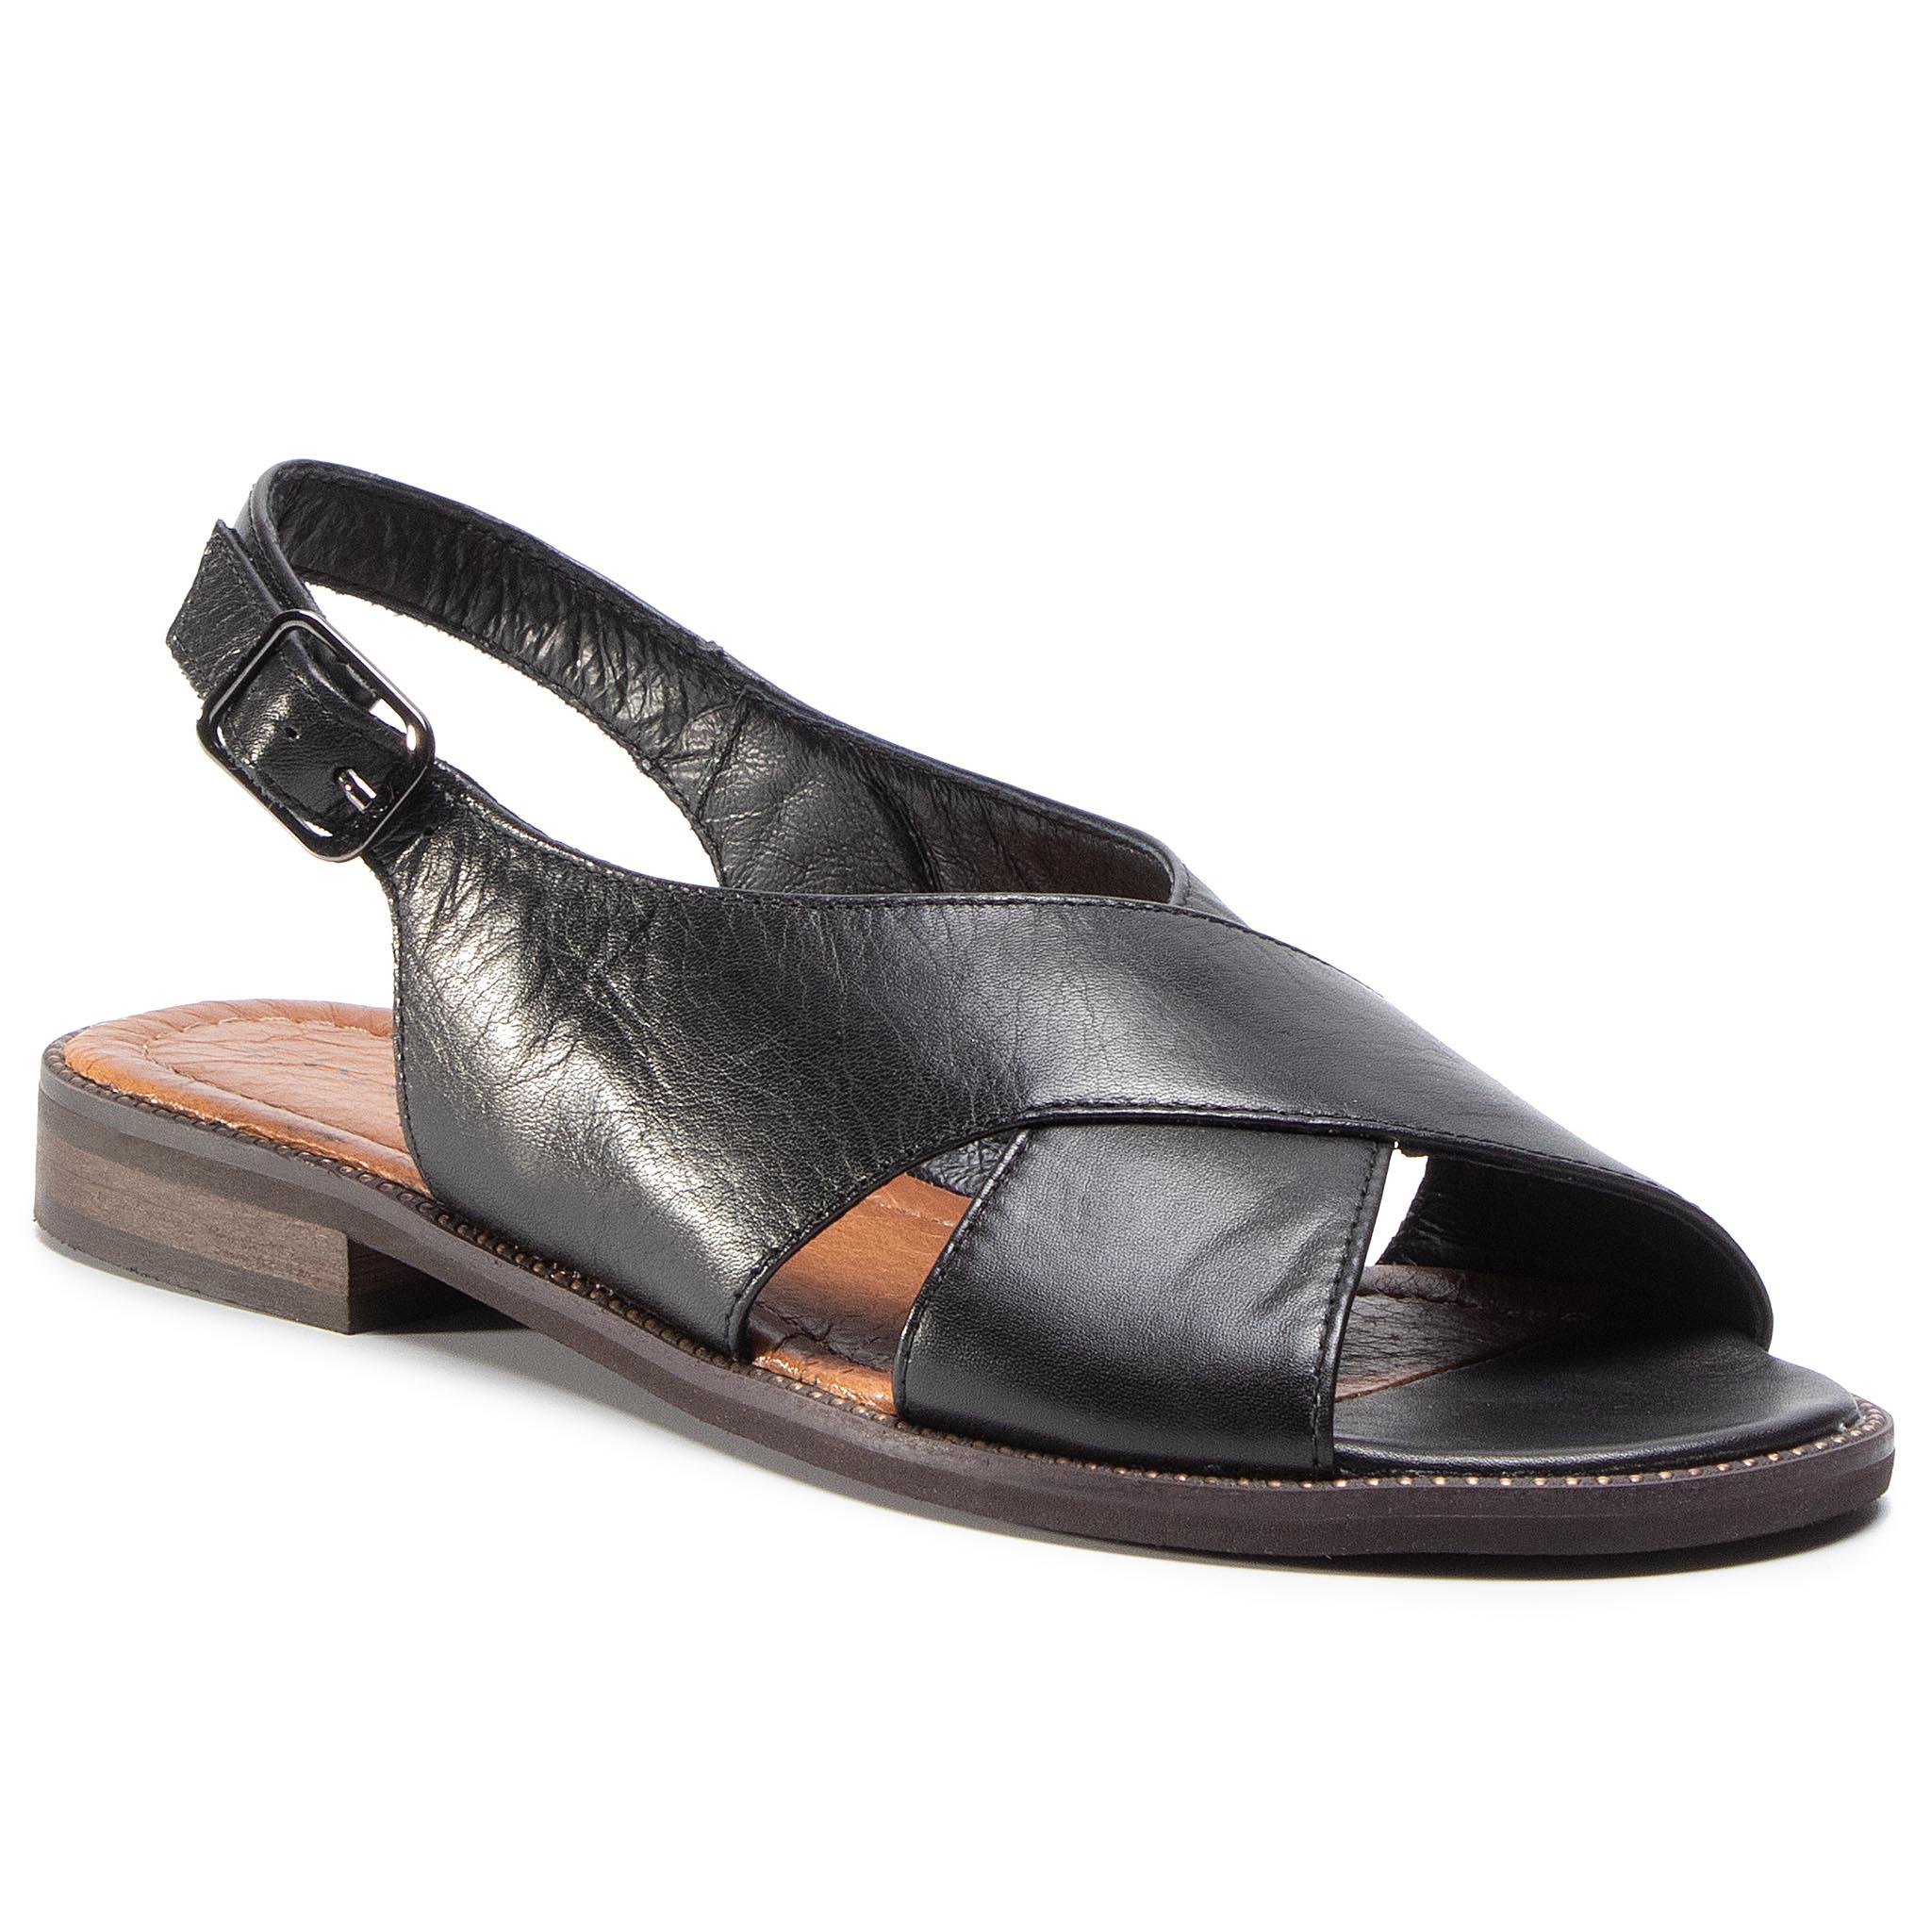 Sandále LASOCKI - TTT-M002-01 Black